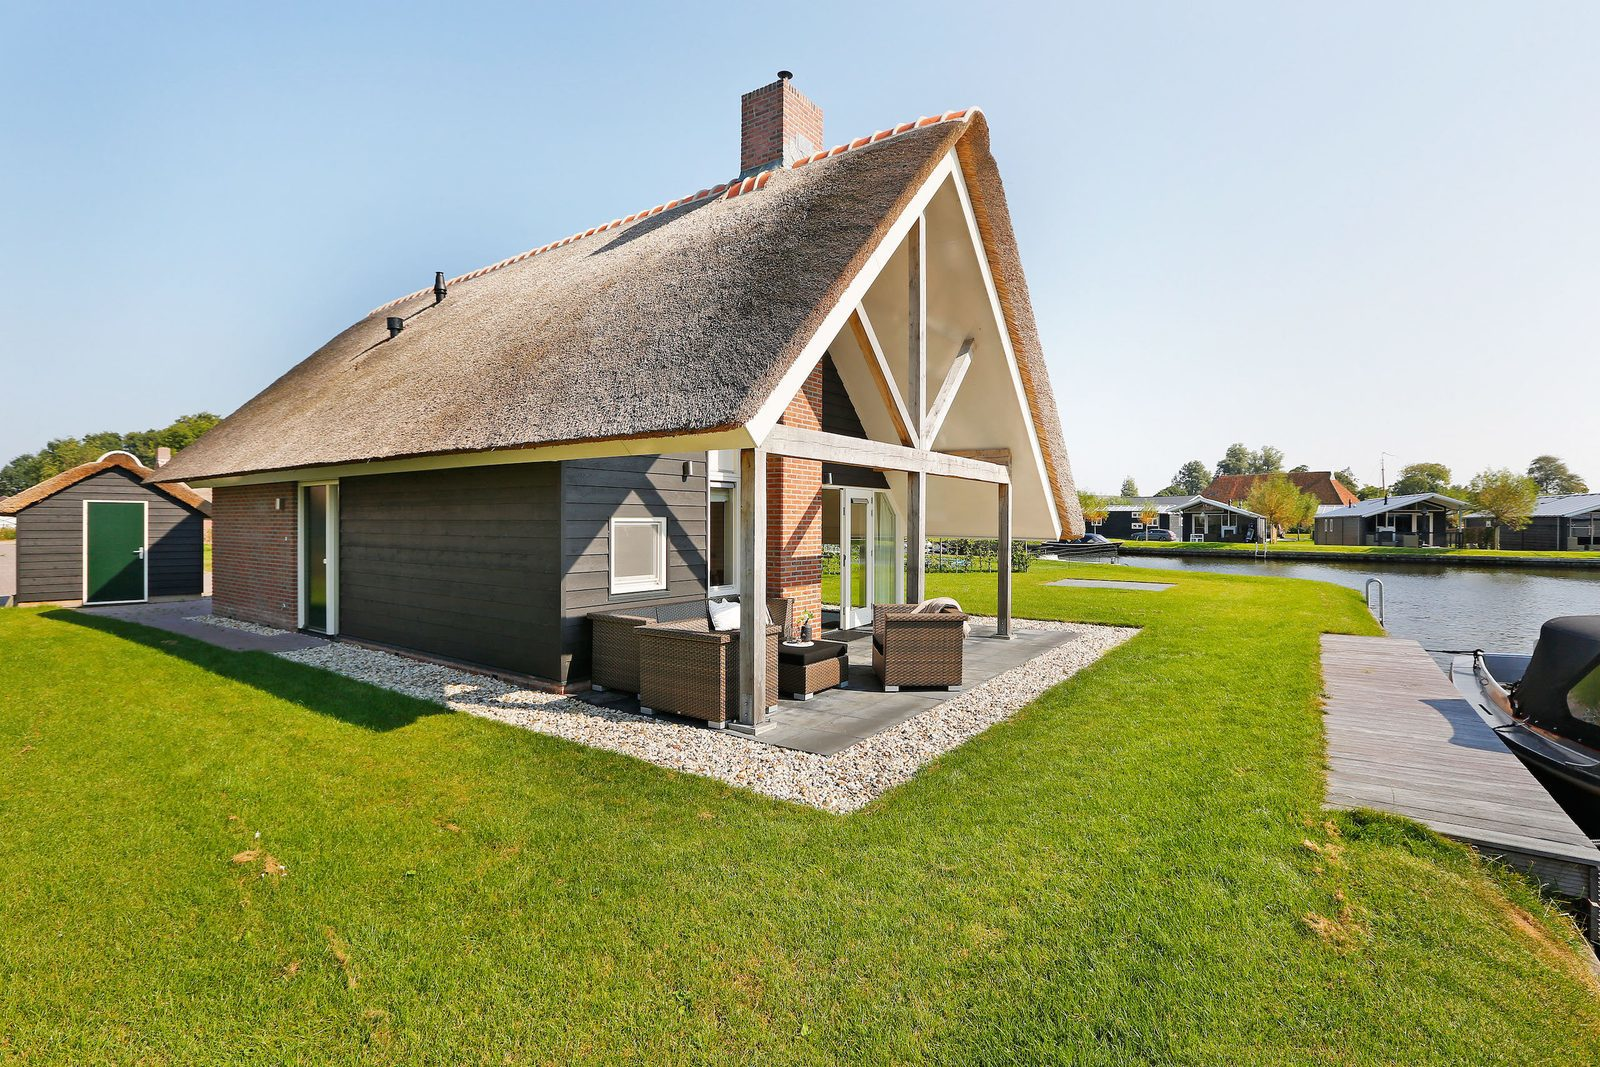 Vrijrijck - Friesland